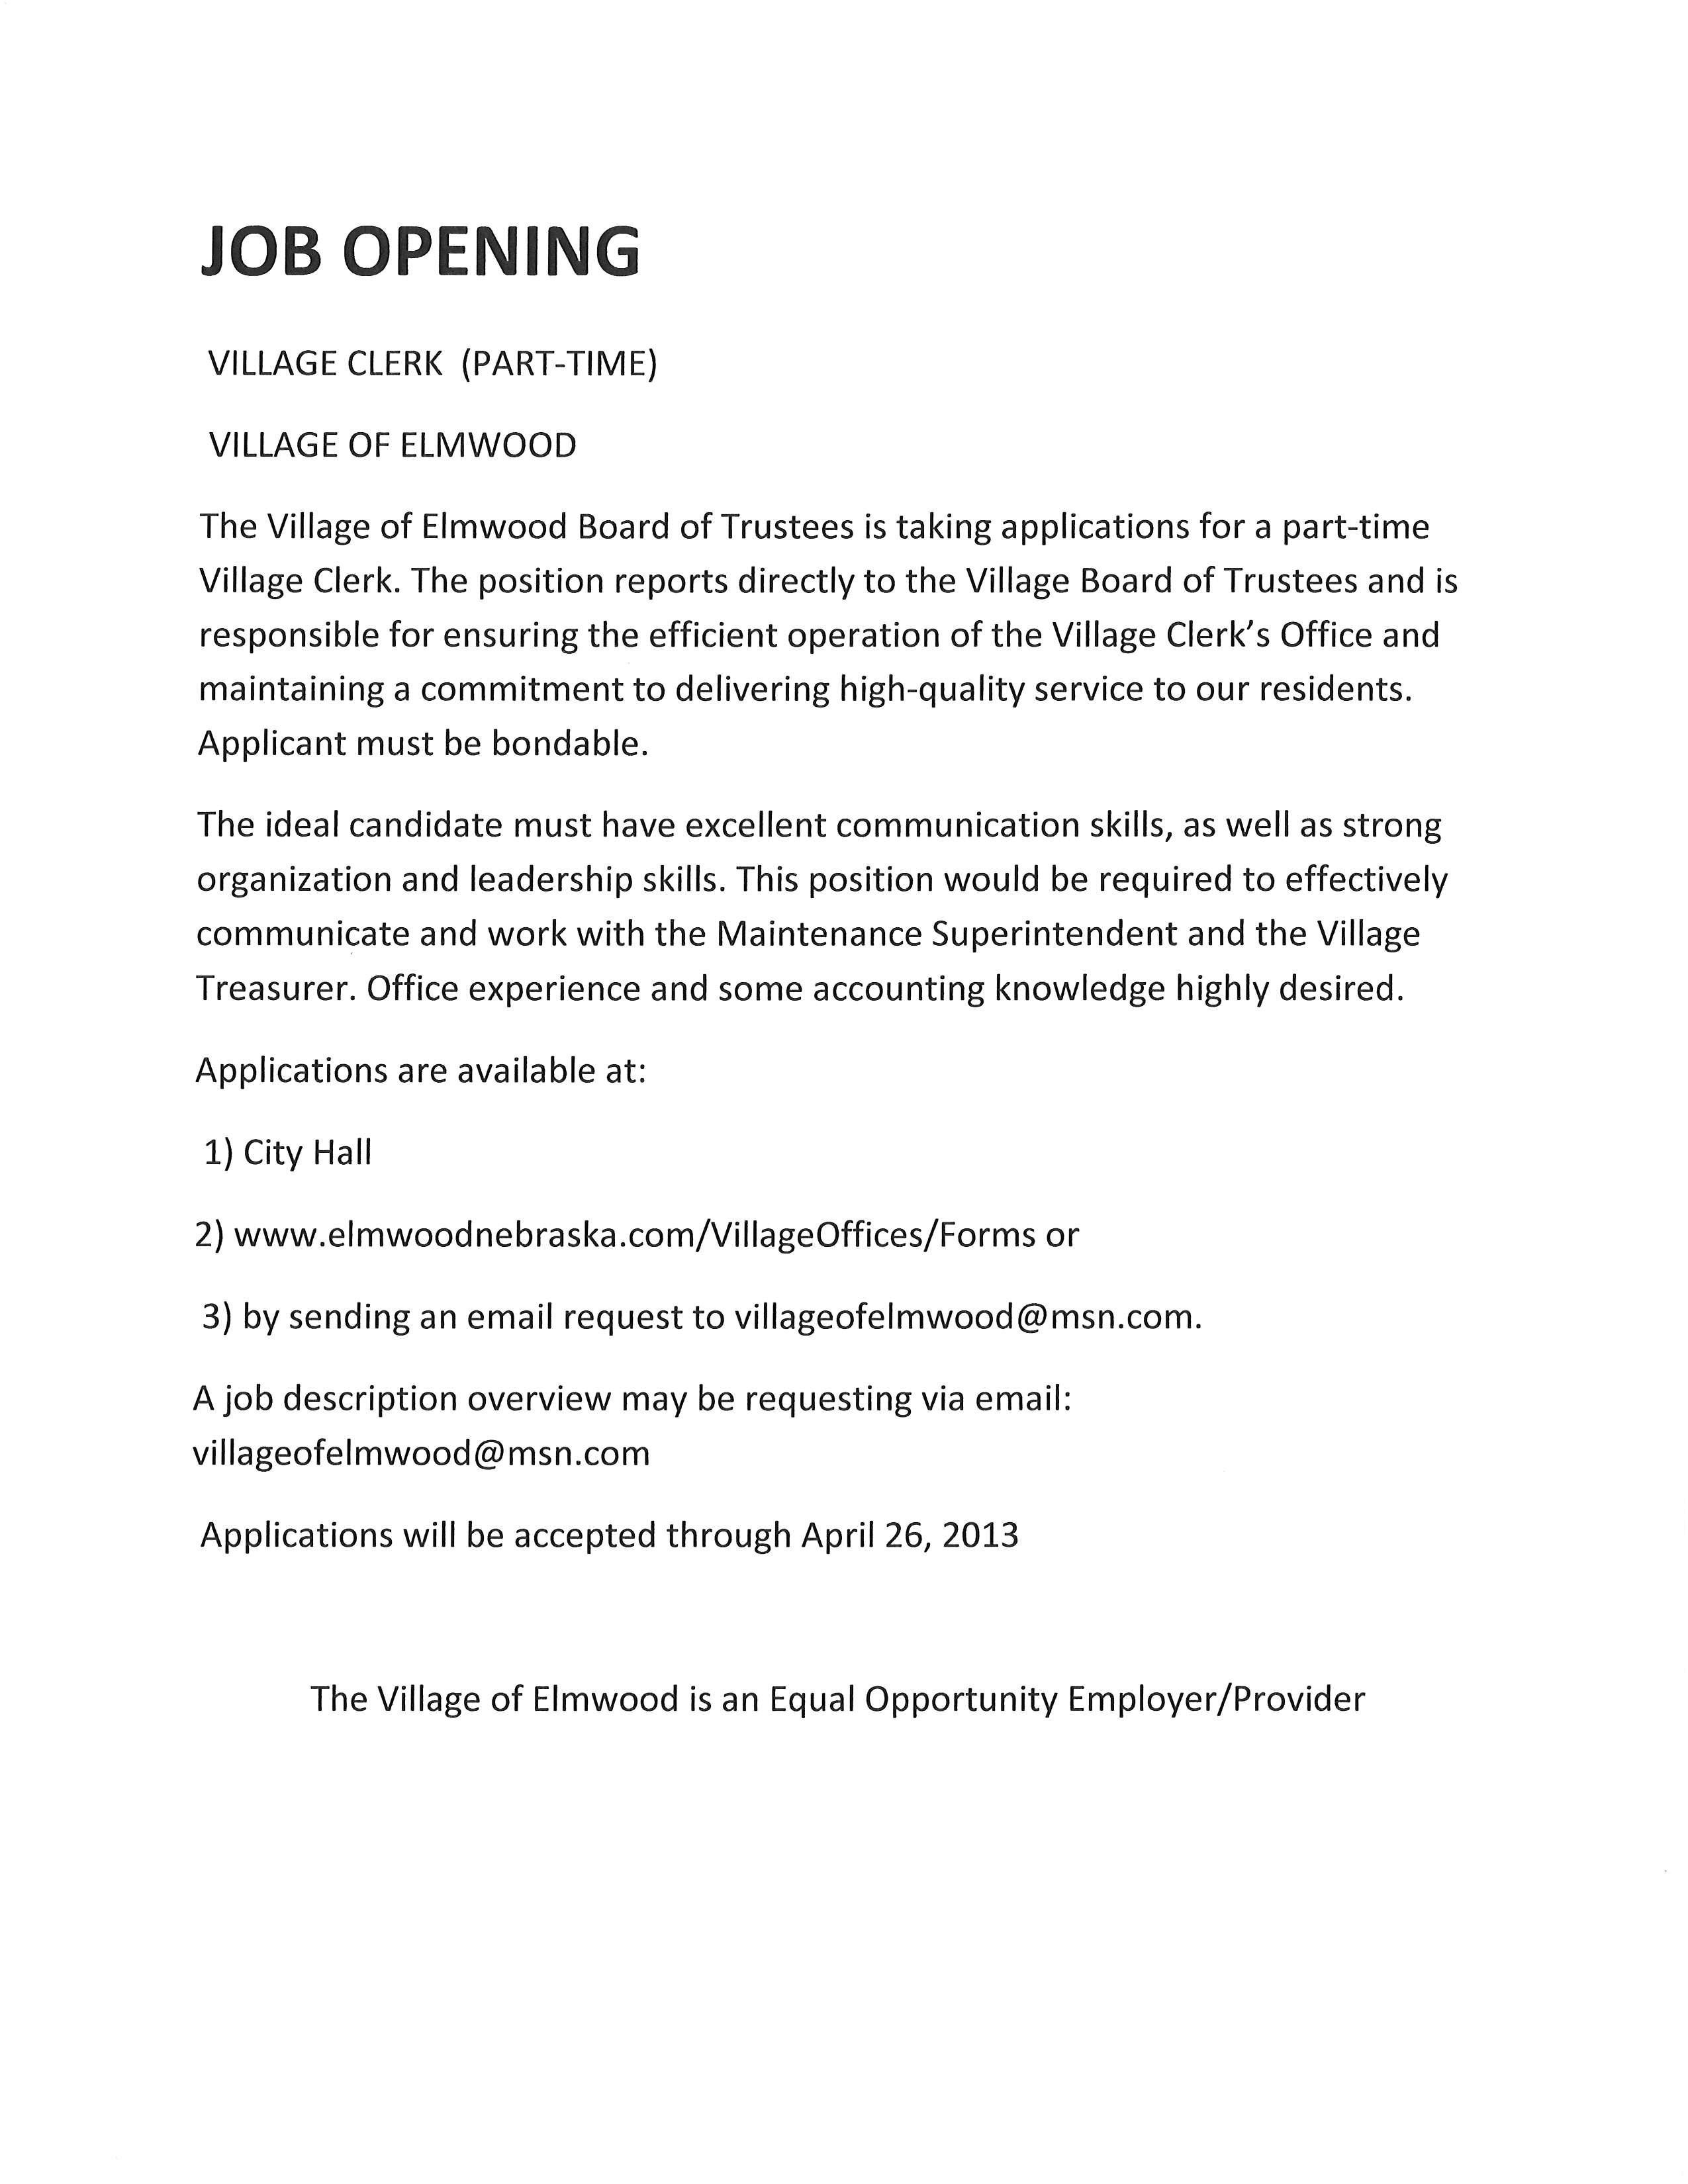 Elmwood newsletter april 24 2013 village parttimeclerkjobposting falaconquin